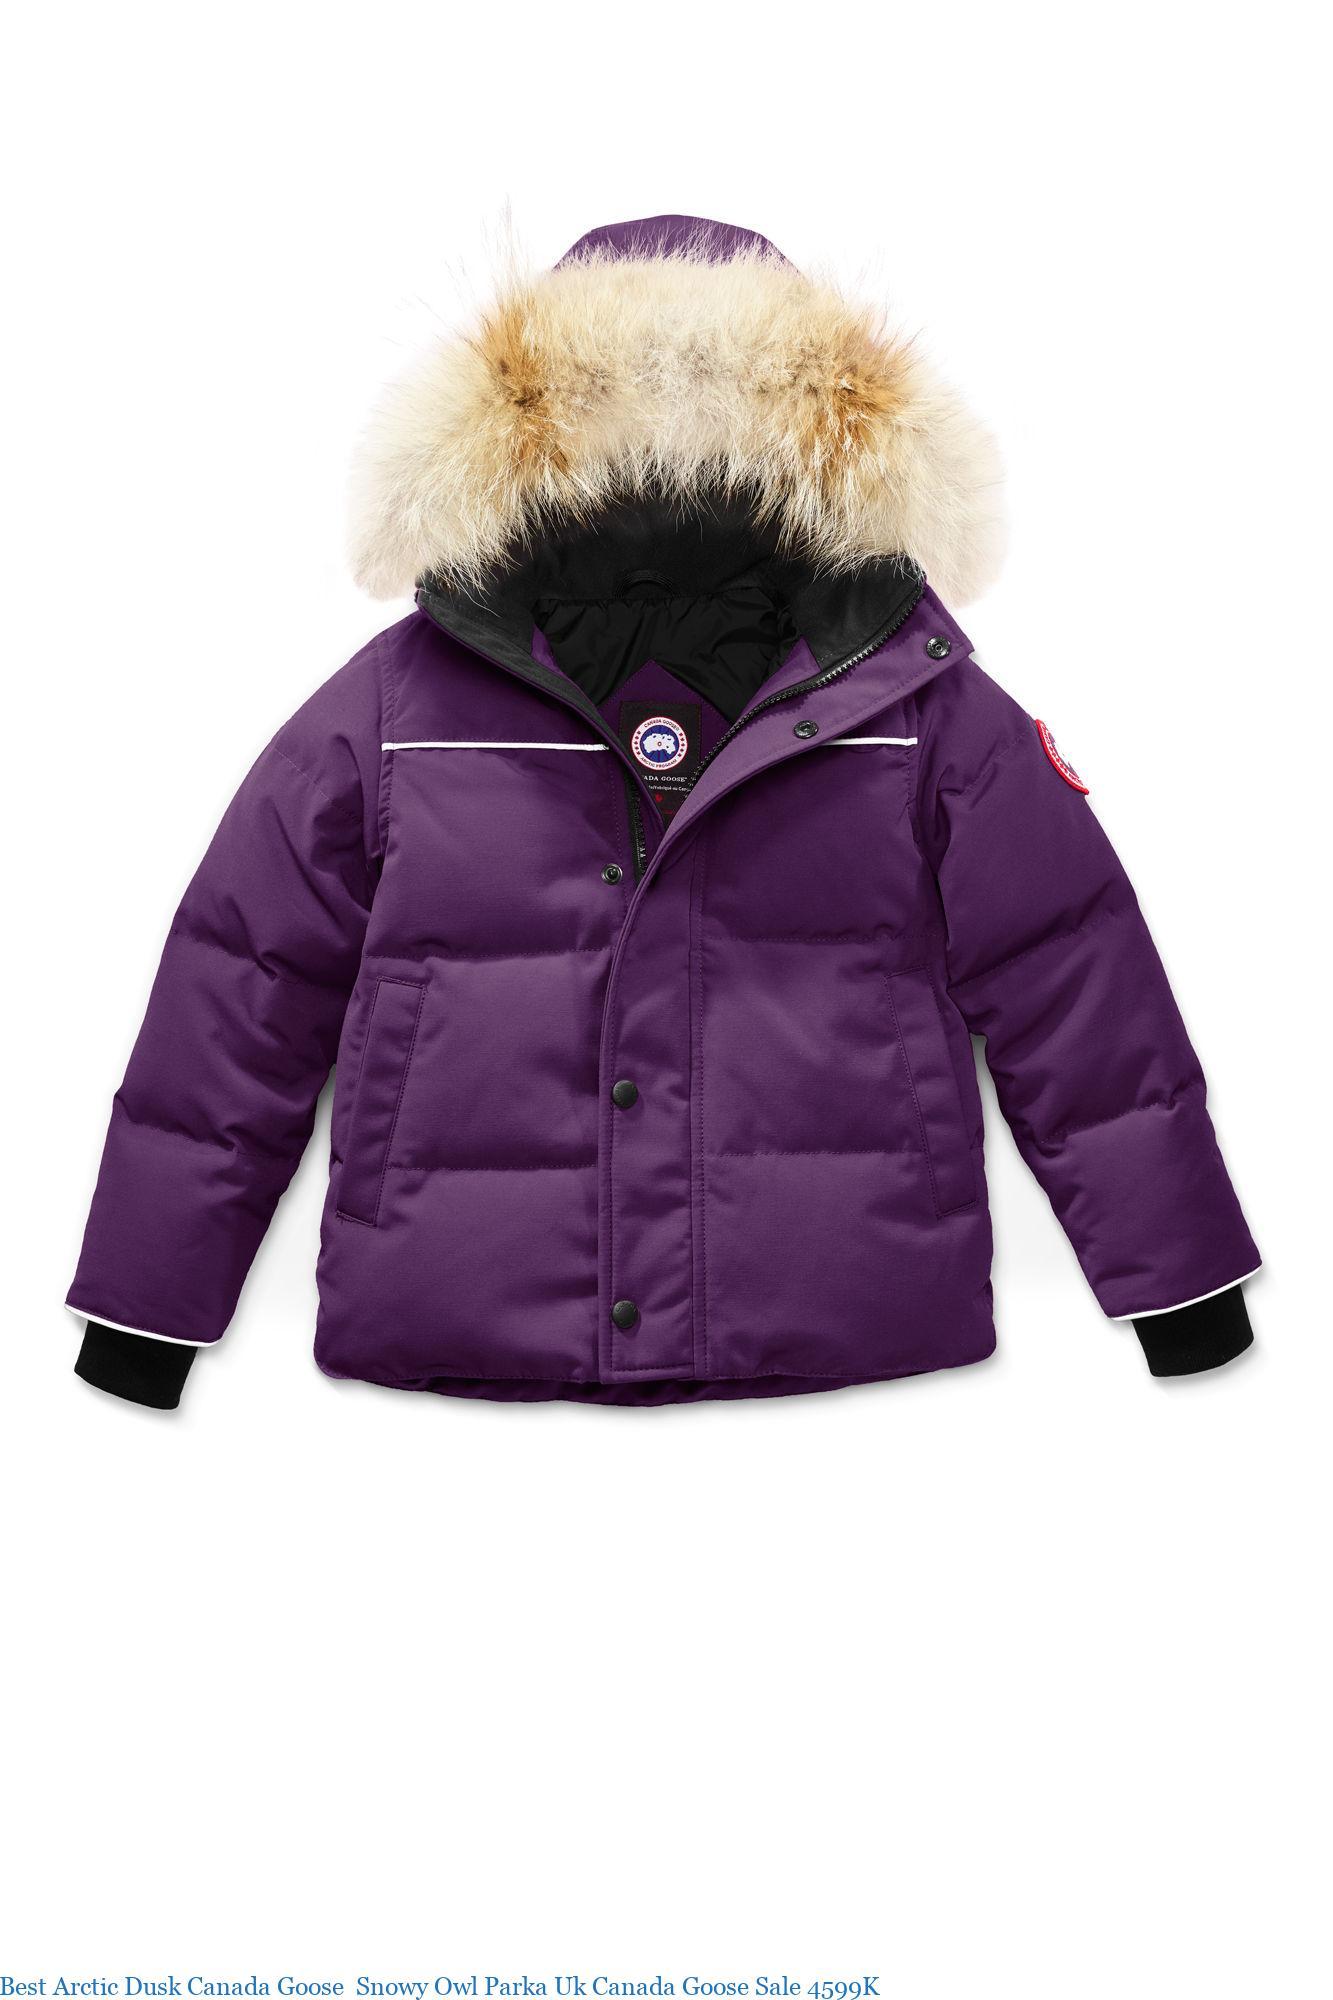 Best Arctic Dusk Canada Goose Snowy Owl Parka Uk Canada Goose Sale 4599K